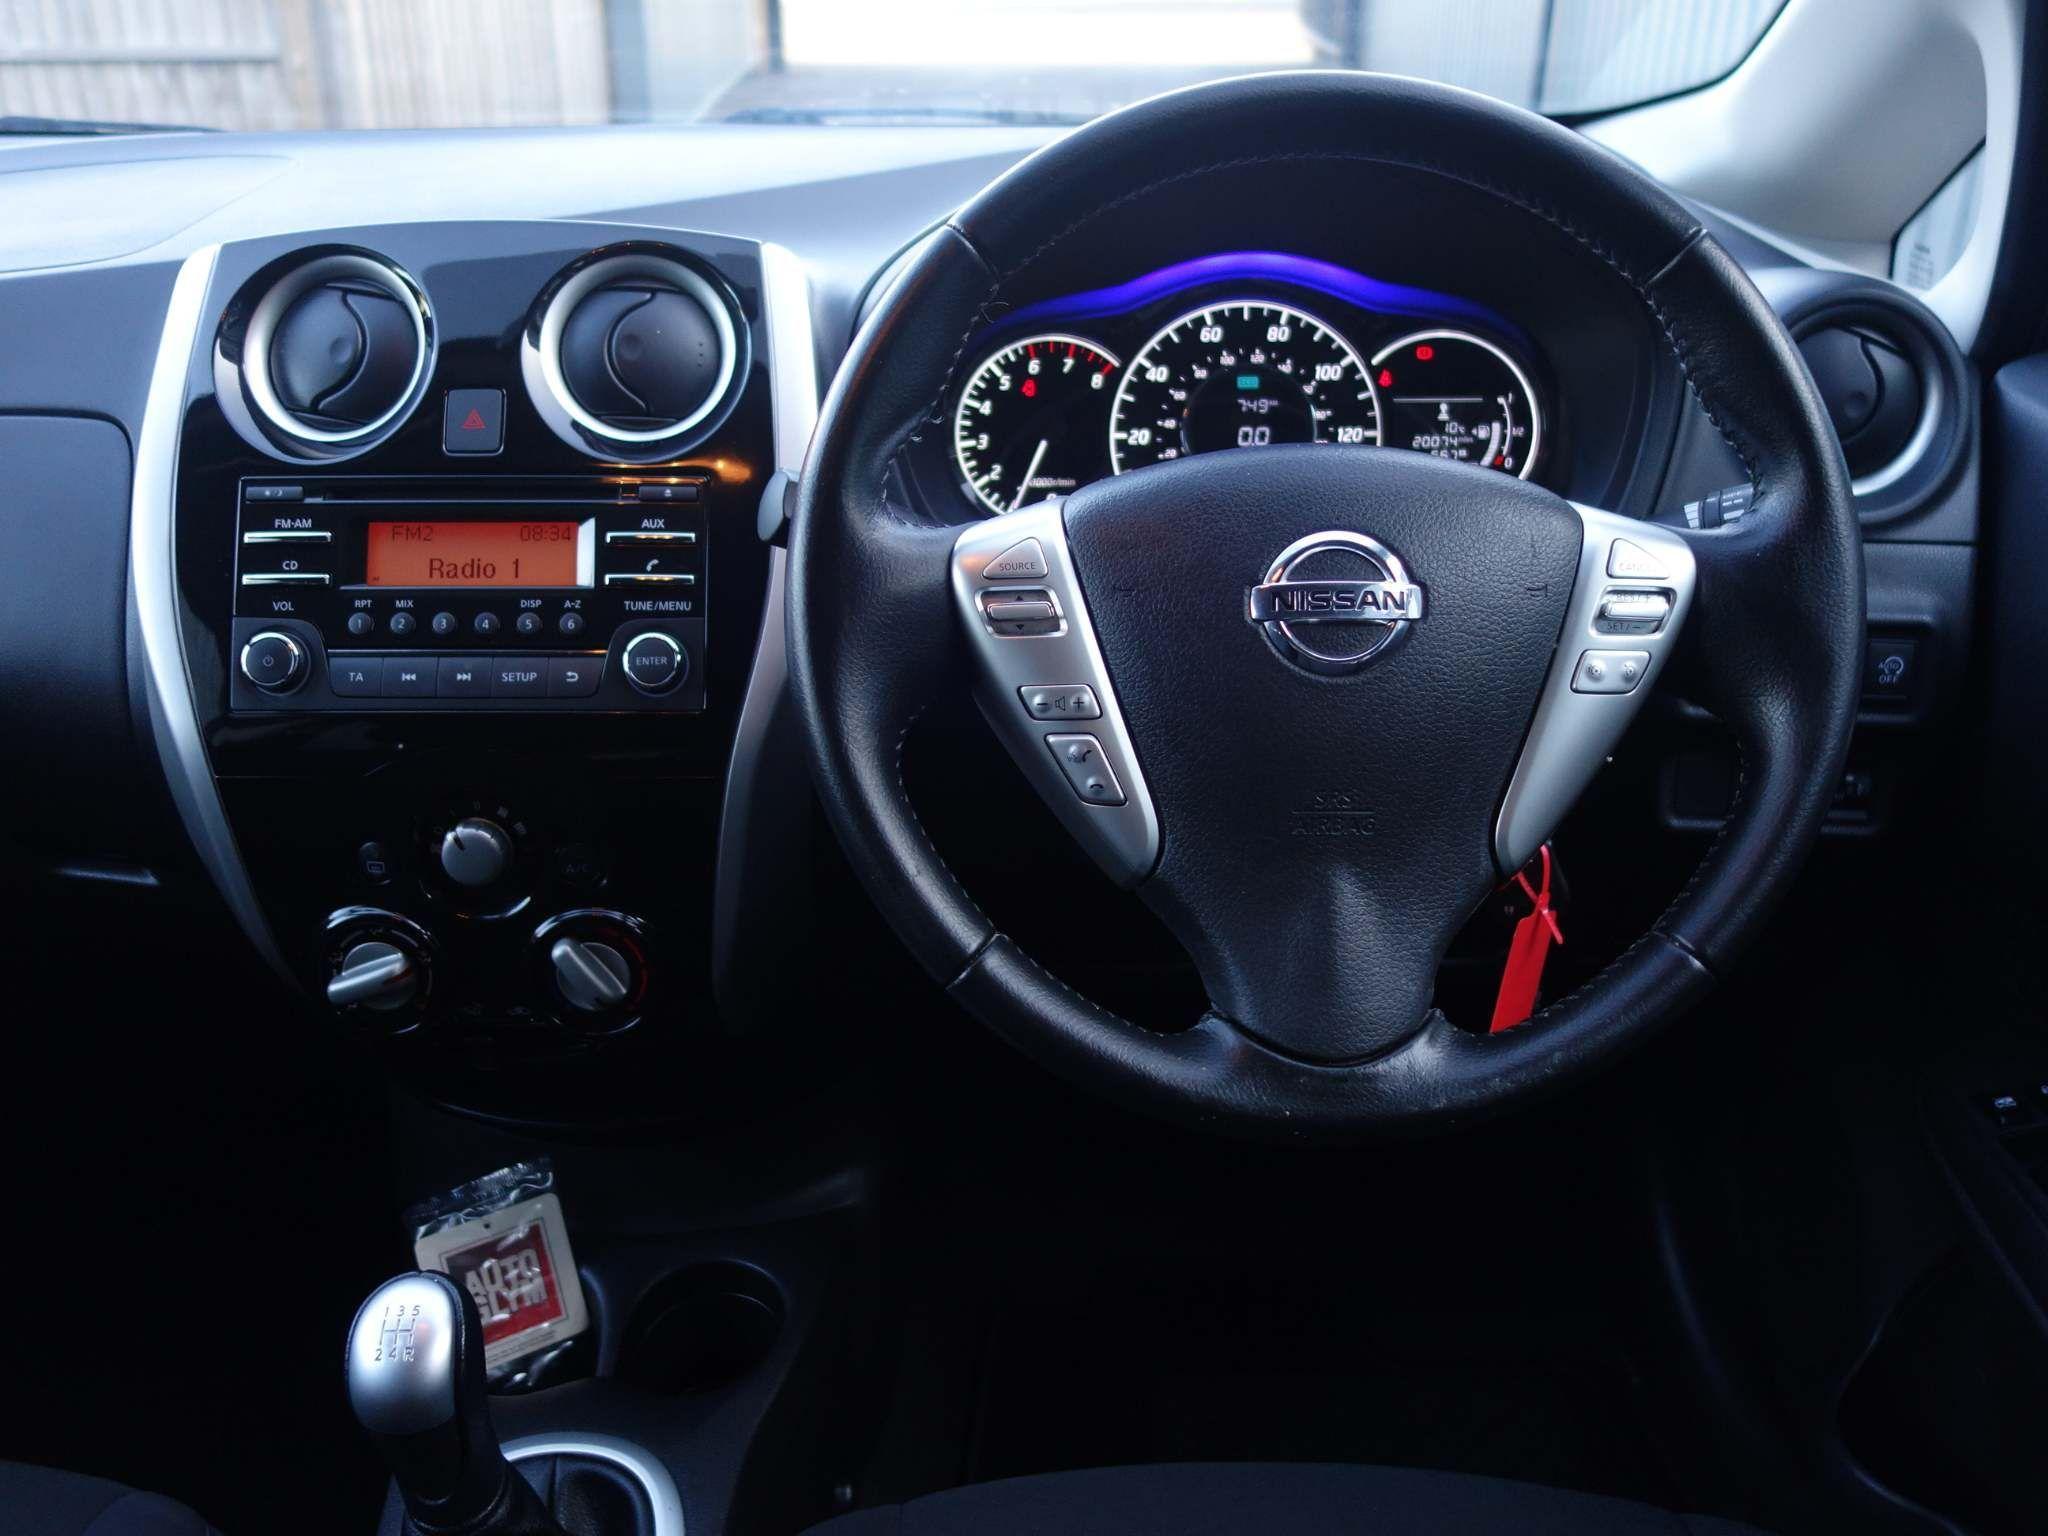 Nissan Note 1.2 Acenta 5dr – WF66WBE